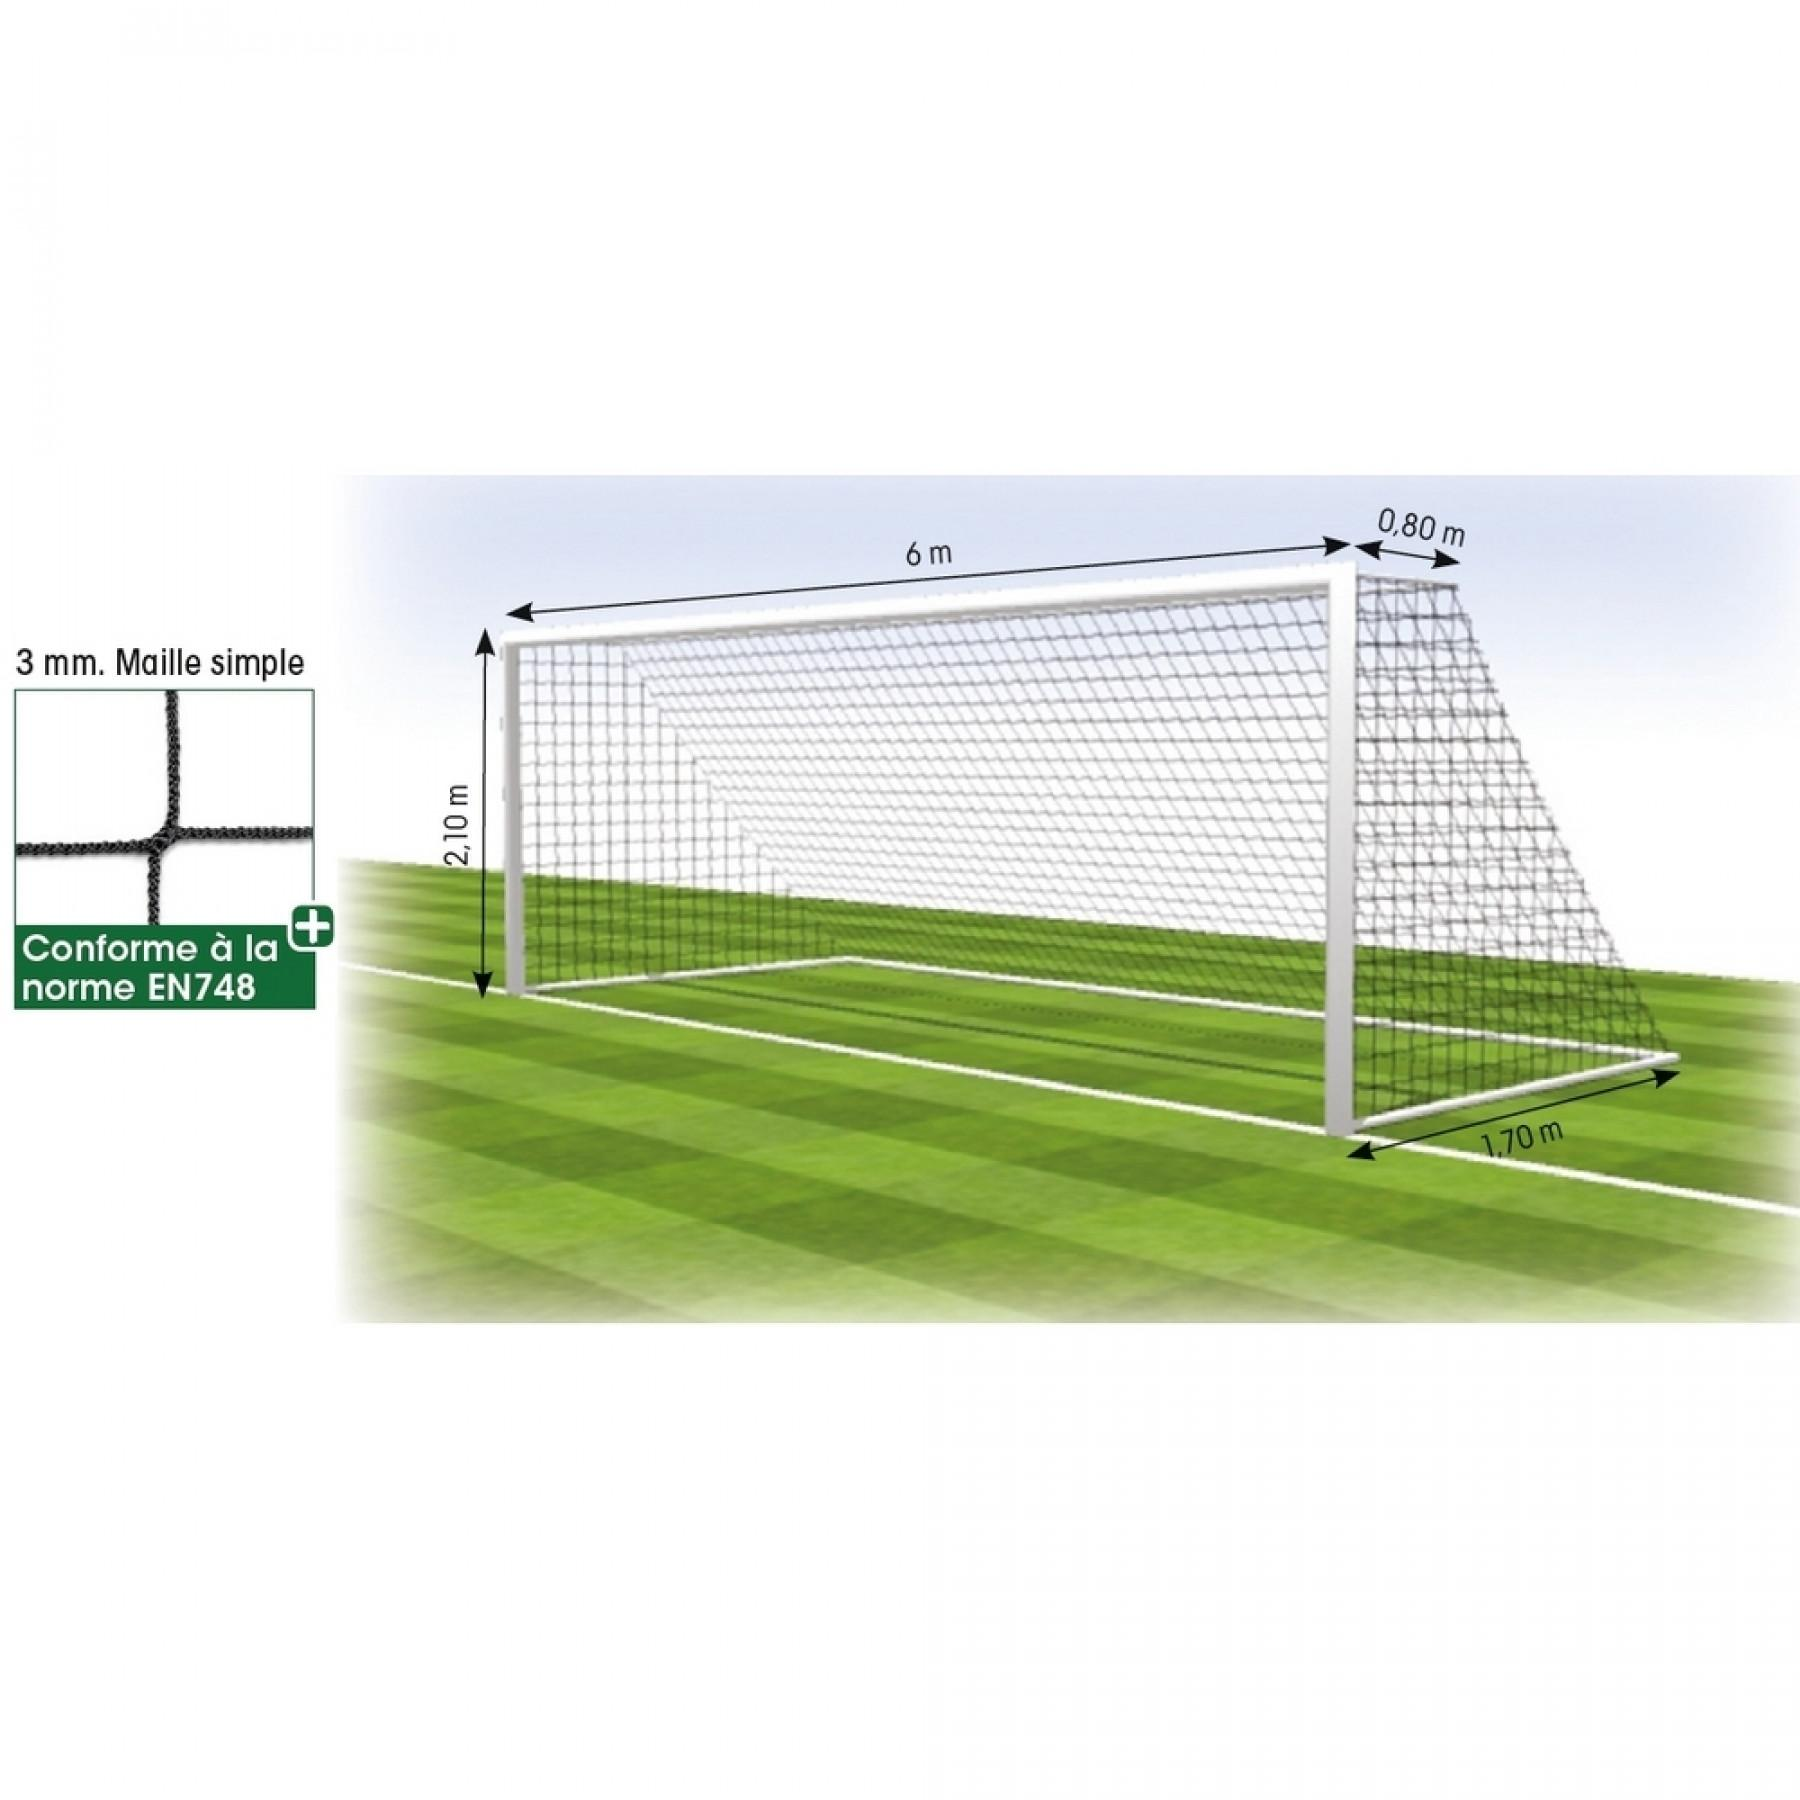 Net football goal 8 fixed 3 mm Tremblay MS 120 (x2)